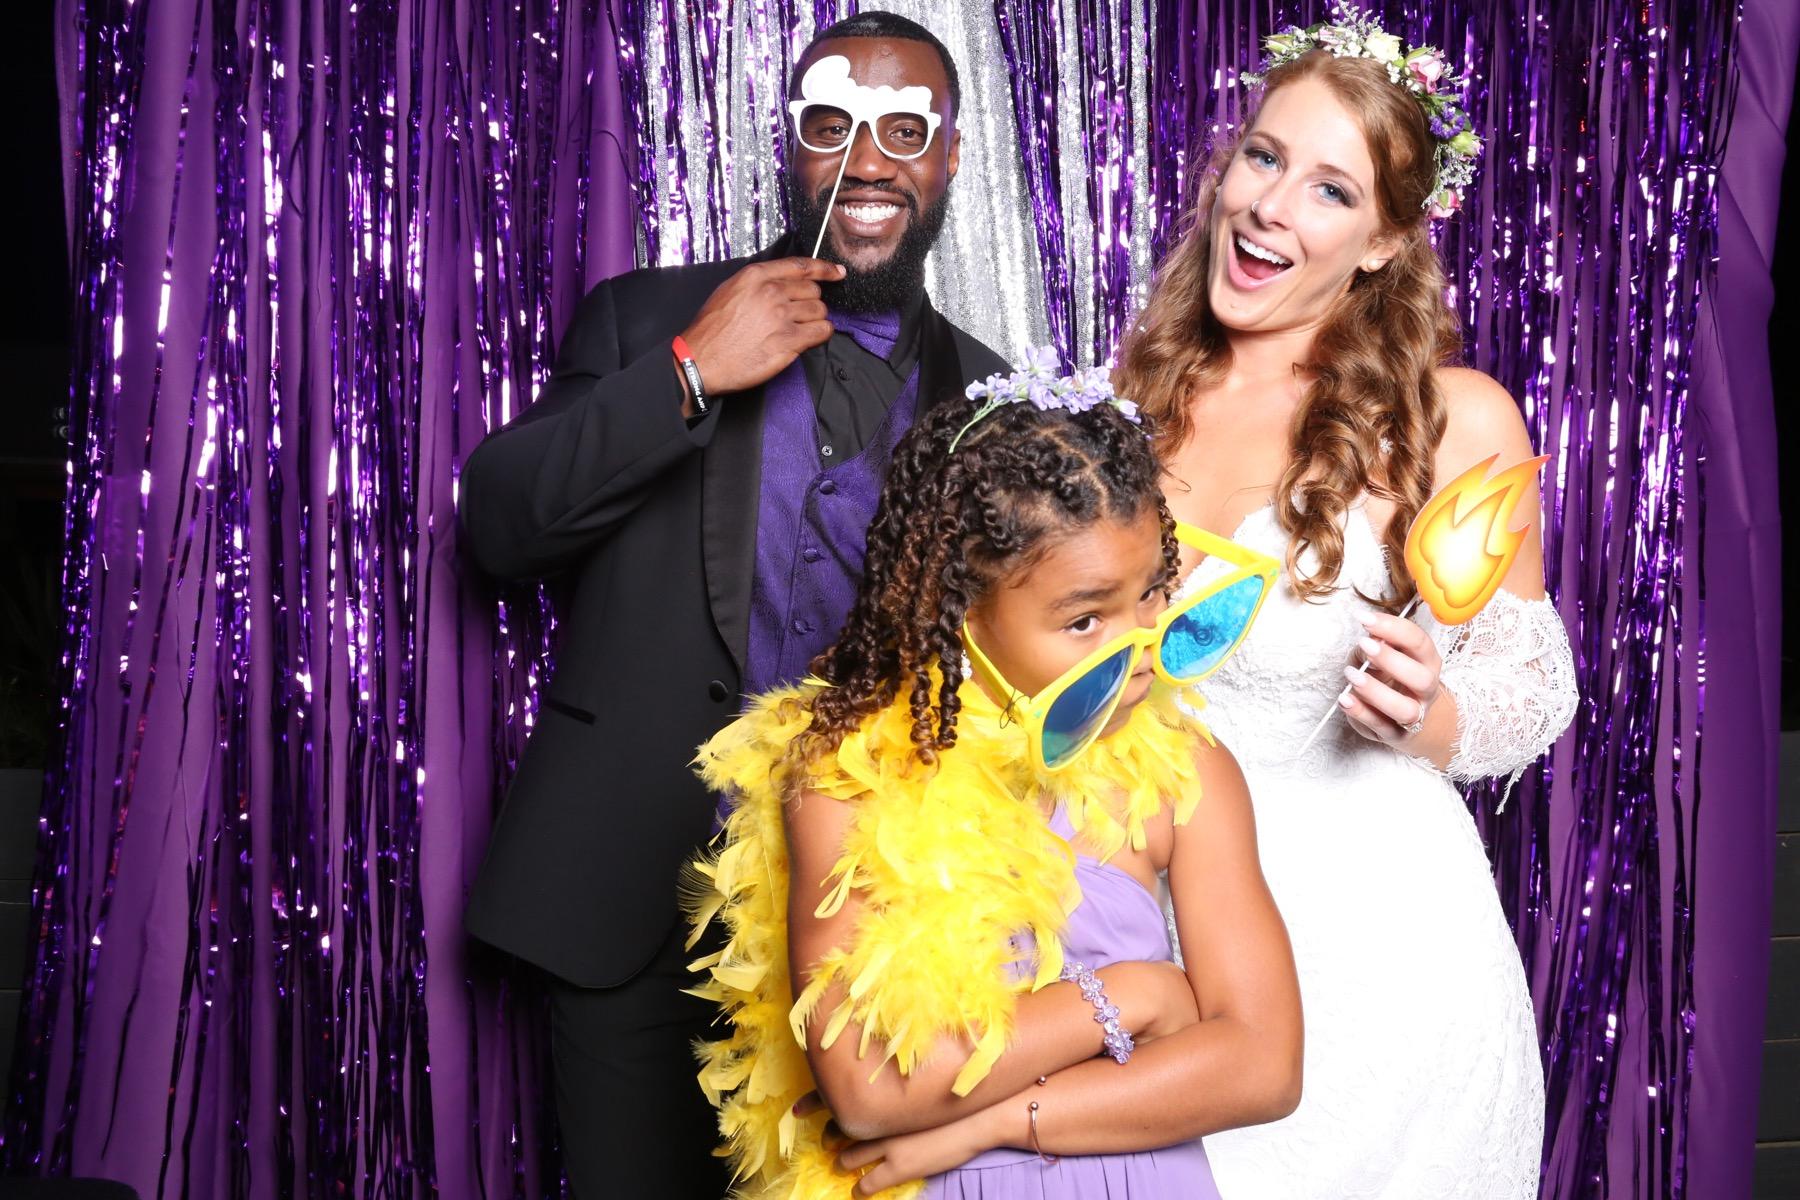 Booth Chamber Photo Booth Harmony Gardens wedding antoine Hart de leon springs photography_66.jpeg